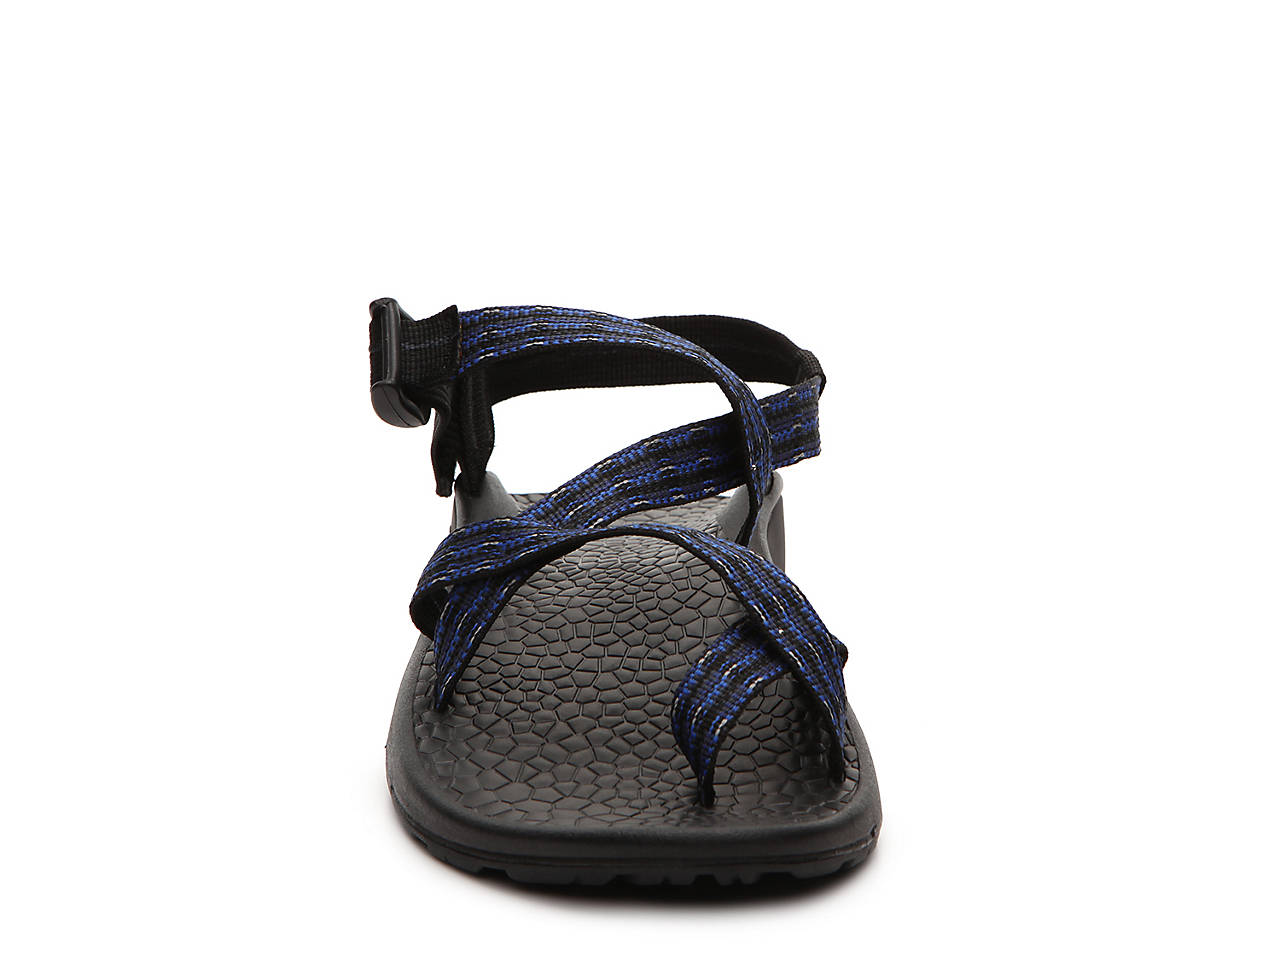 fc5f2219ef5 Chaco Updraft Ecotread 2 Sandal Men s Shoes